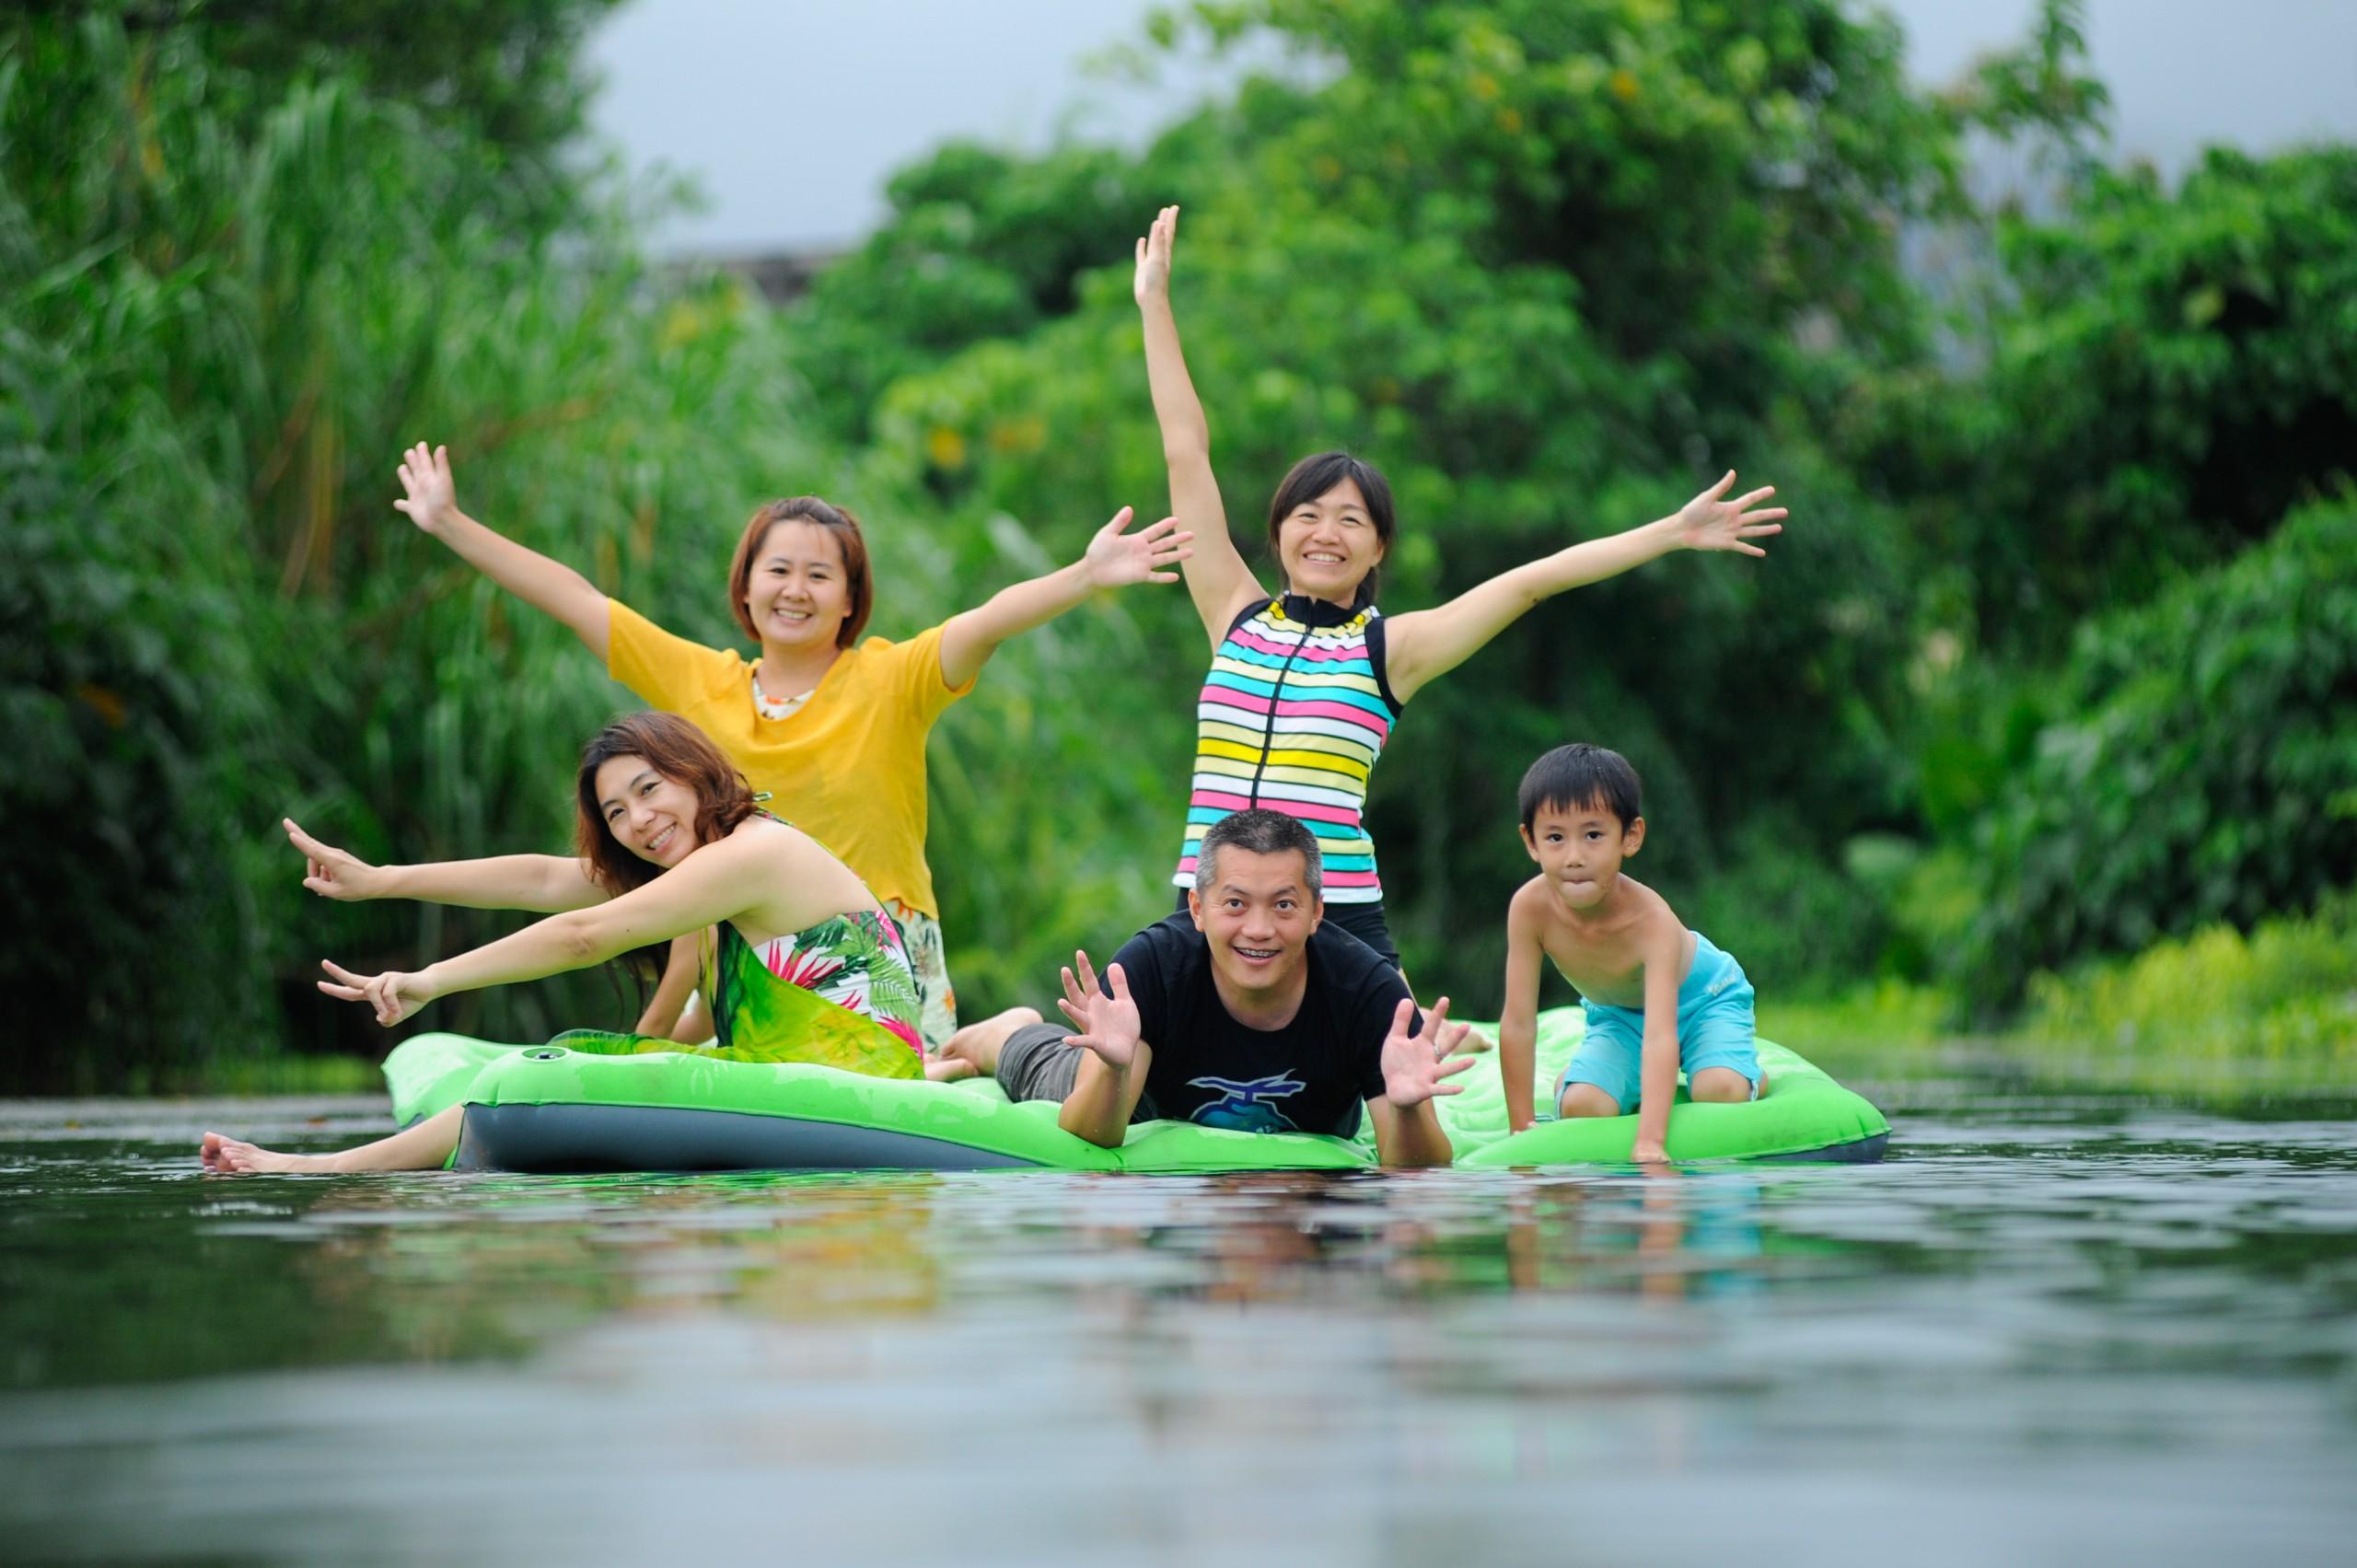 德築-DEZU-project-Fun3sport-inflatable-bed-lake-8